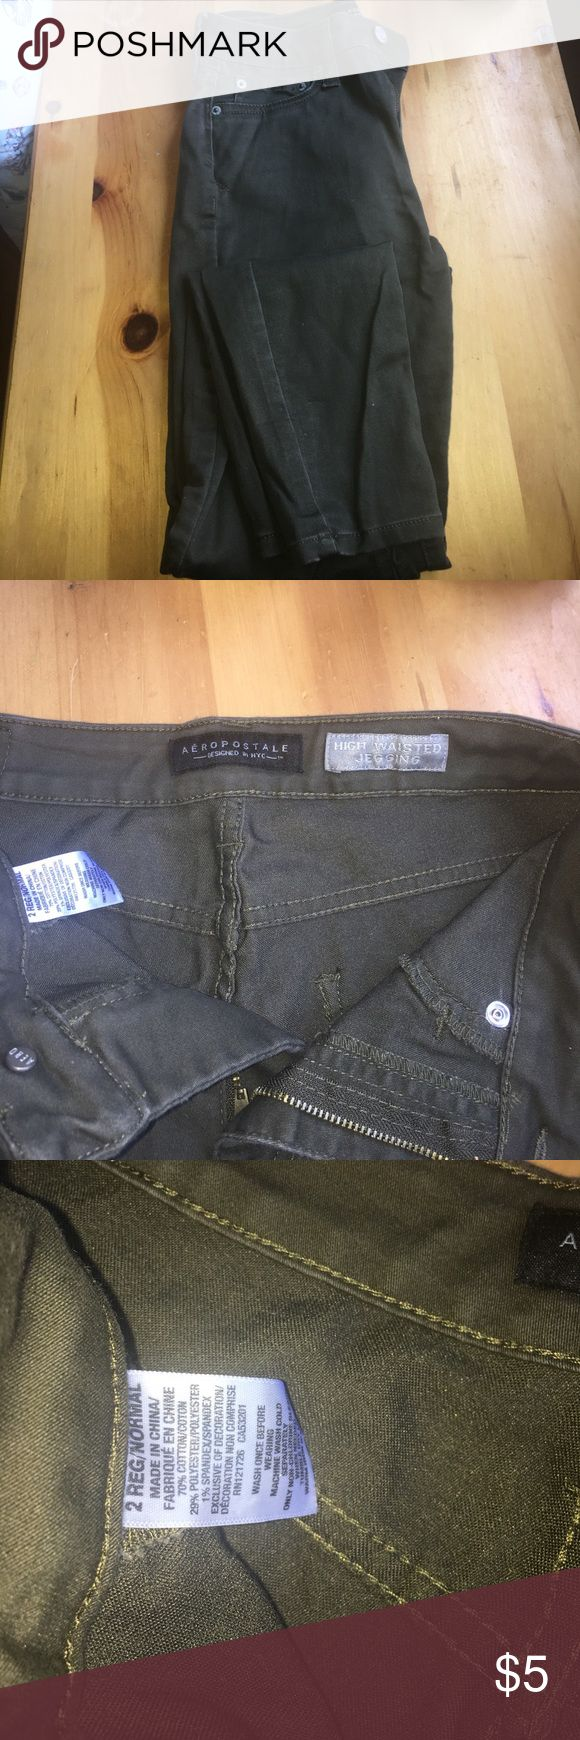 Olive/Army Green Aeropostale Jeggings High waist Jeggings from Aeropostale. Olive/army green color. Super soft! Never worn. Aeropostale Pants Skinny